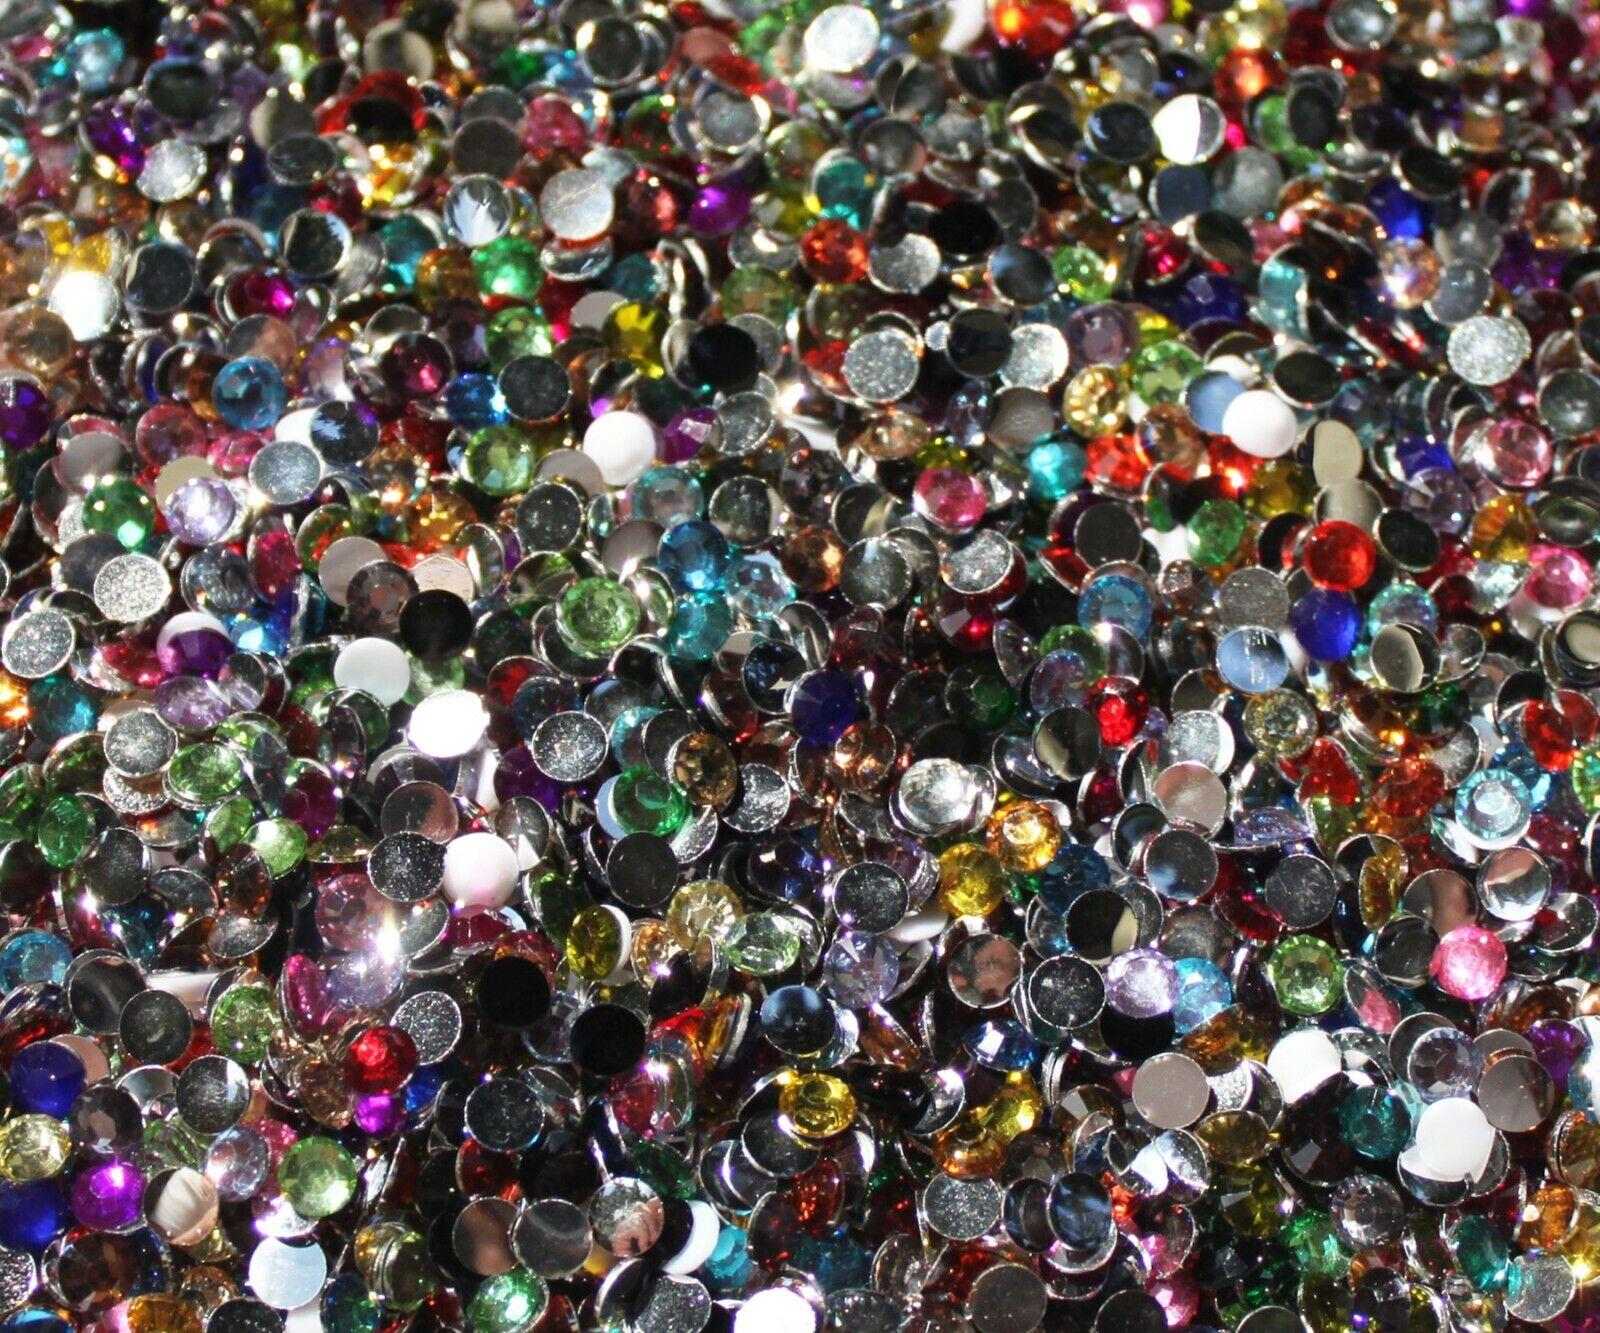 1000 Crystal Flat Back Resin Rhinestones Gems 60 colors, 2mm, 3mm, 4mm, 5mm, 6.5 MIXED REGULAR COLOUR